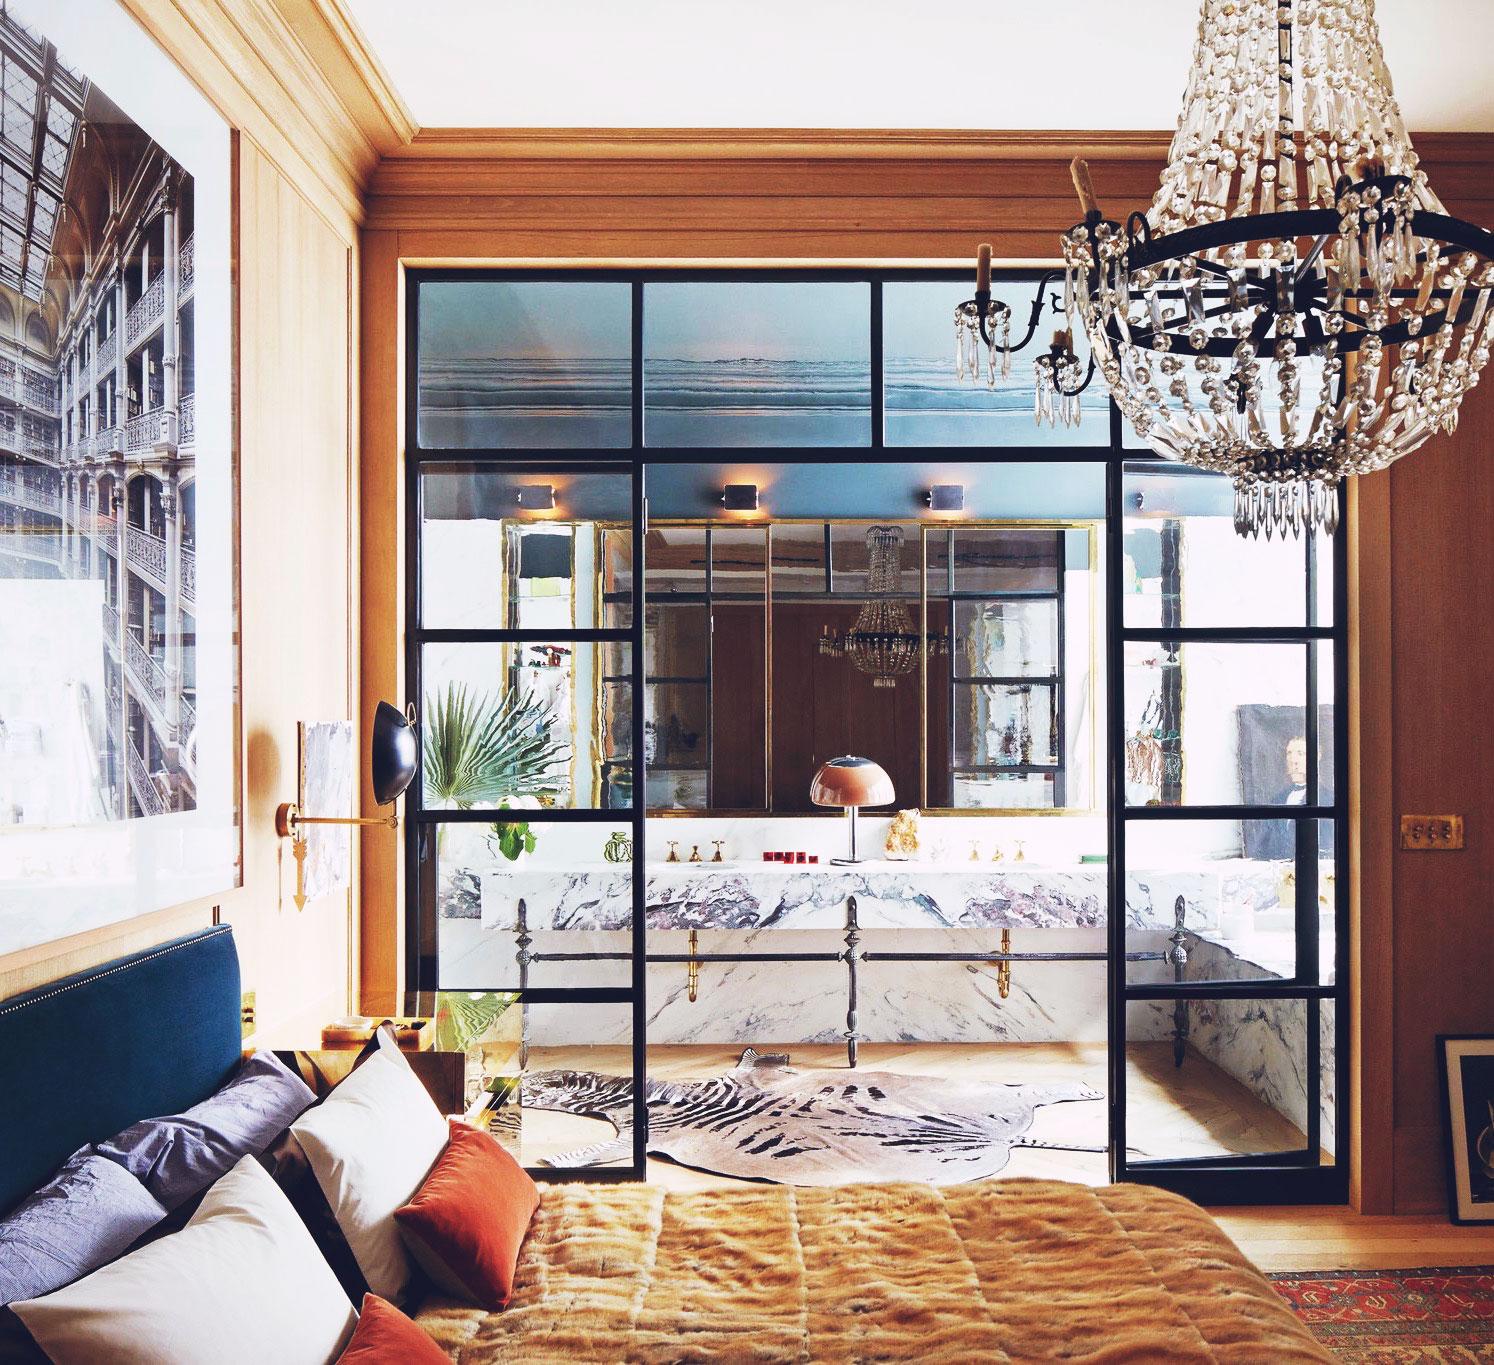 Décor Inspiration: Jenna Lyons's SoHo Loft